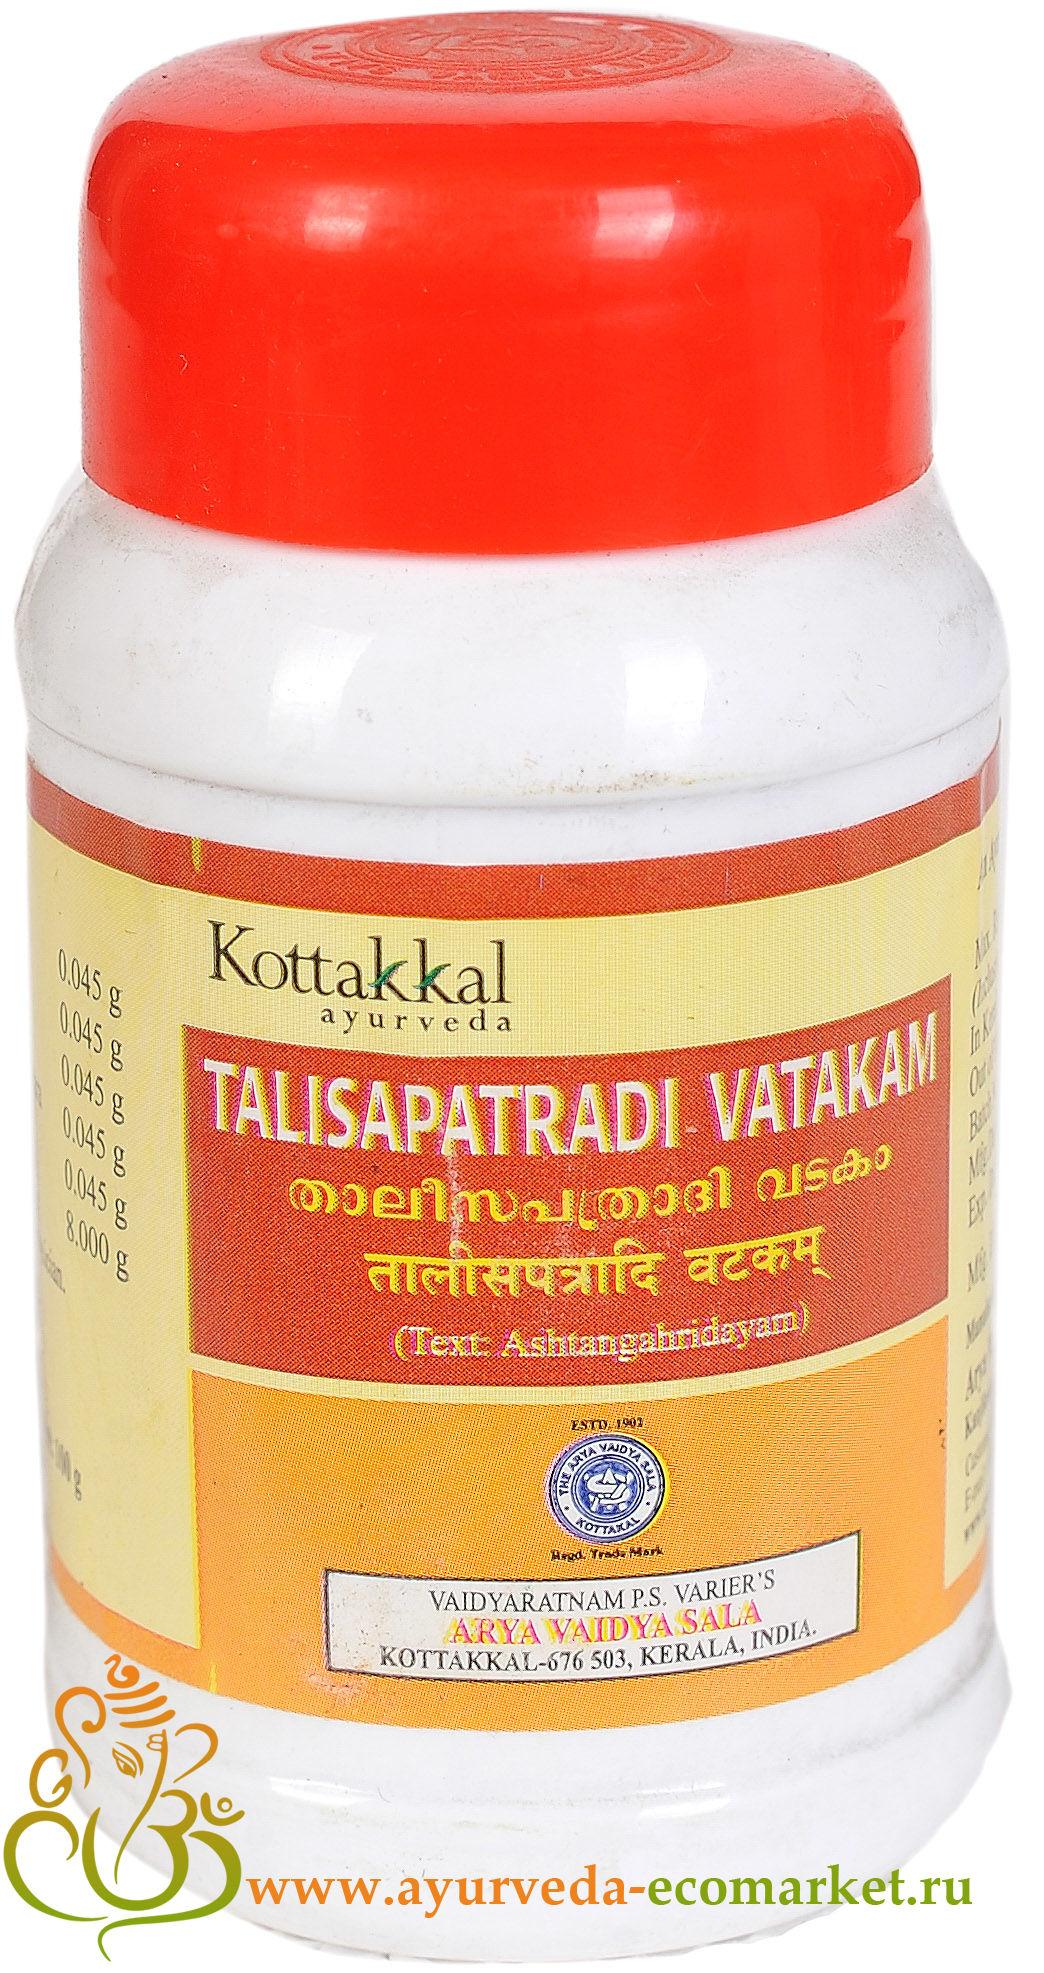 "Thalisapatradi Vatakam"", 100 gr. Kottakal"